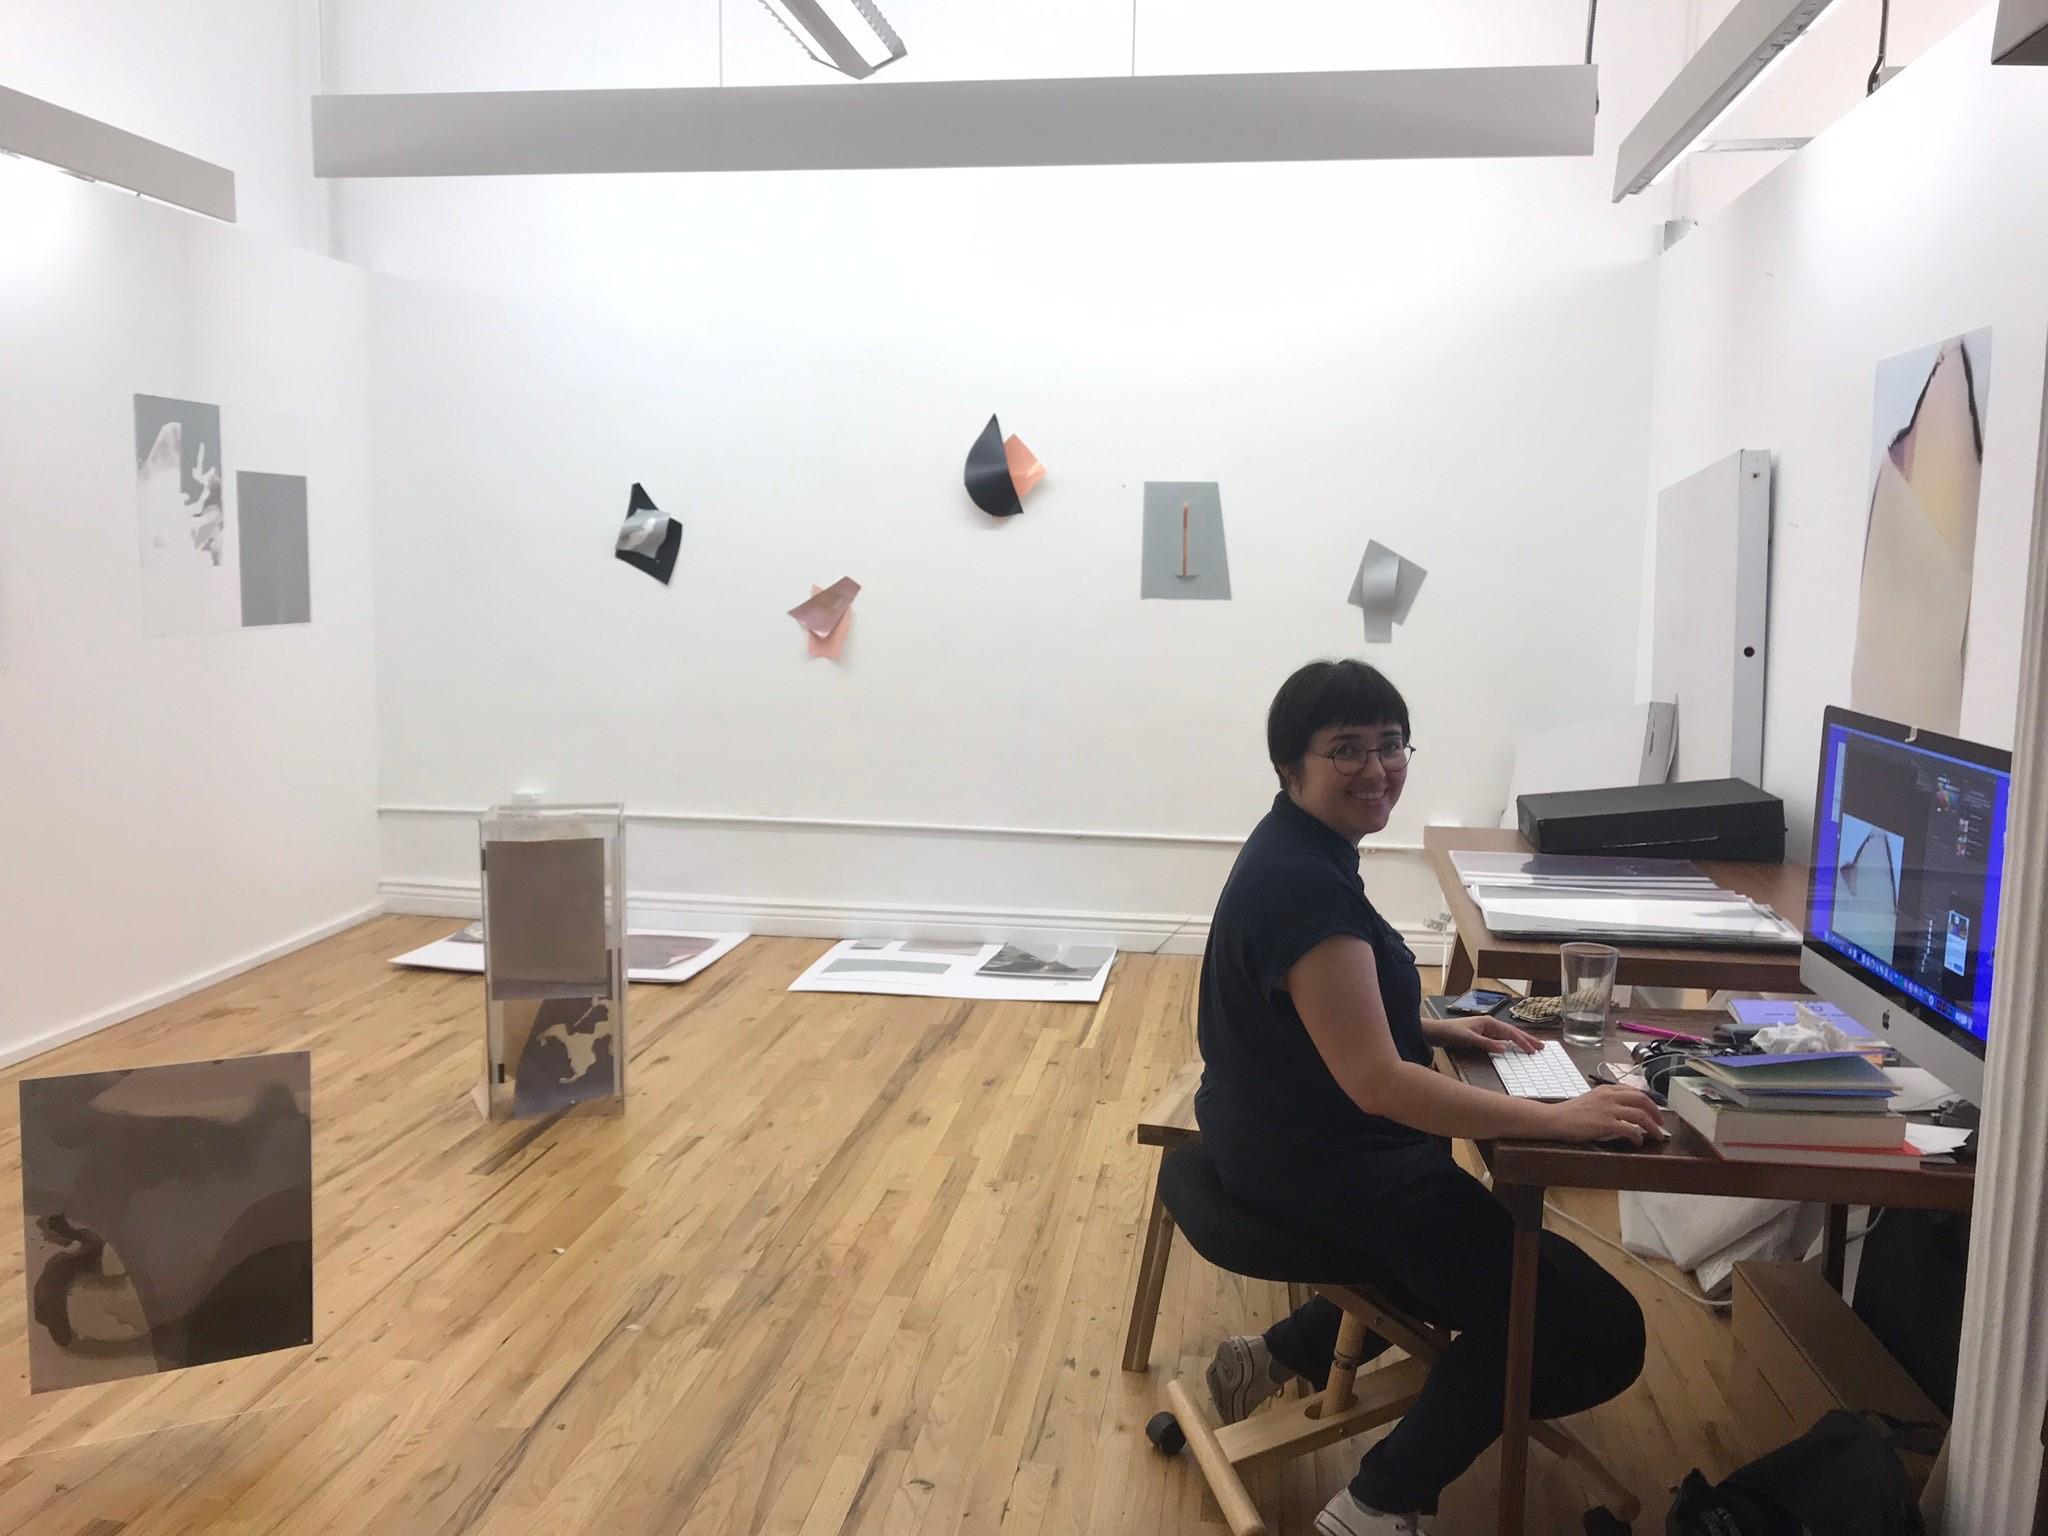 Cati Bestard, Open Studios 2019